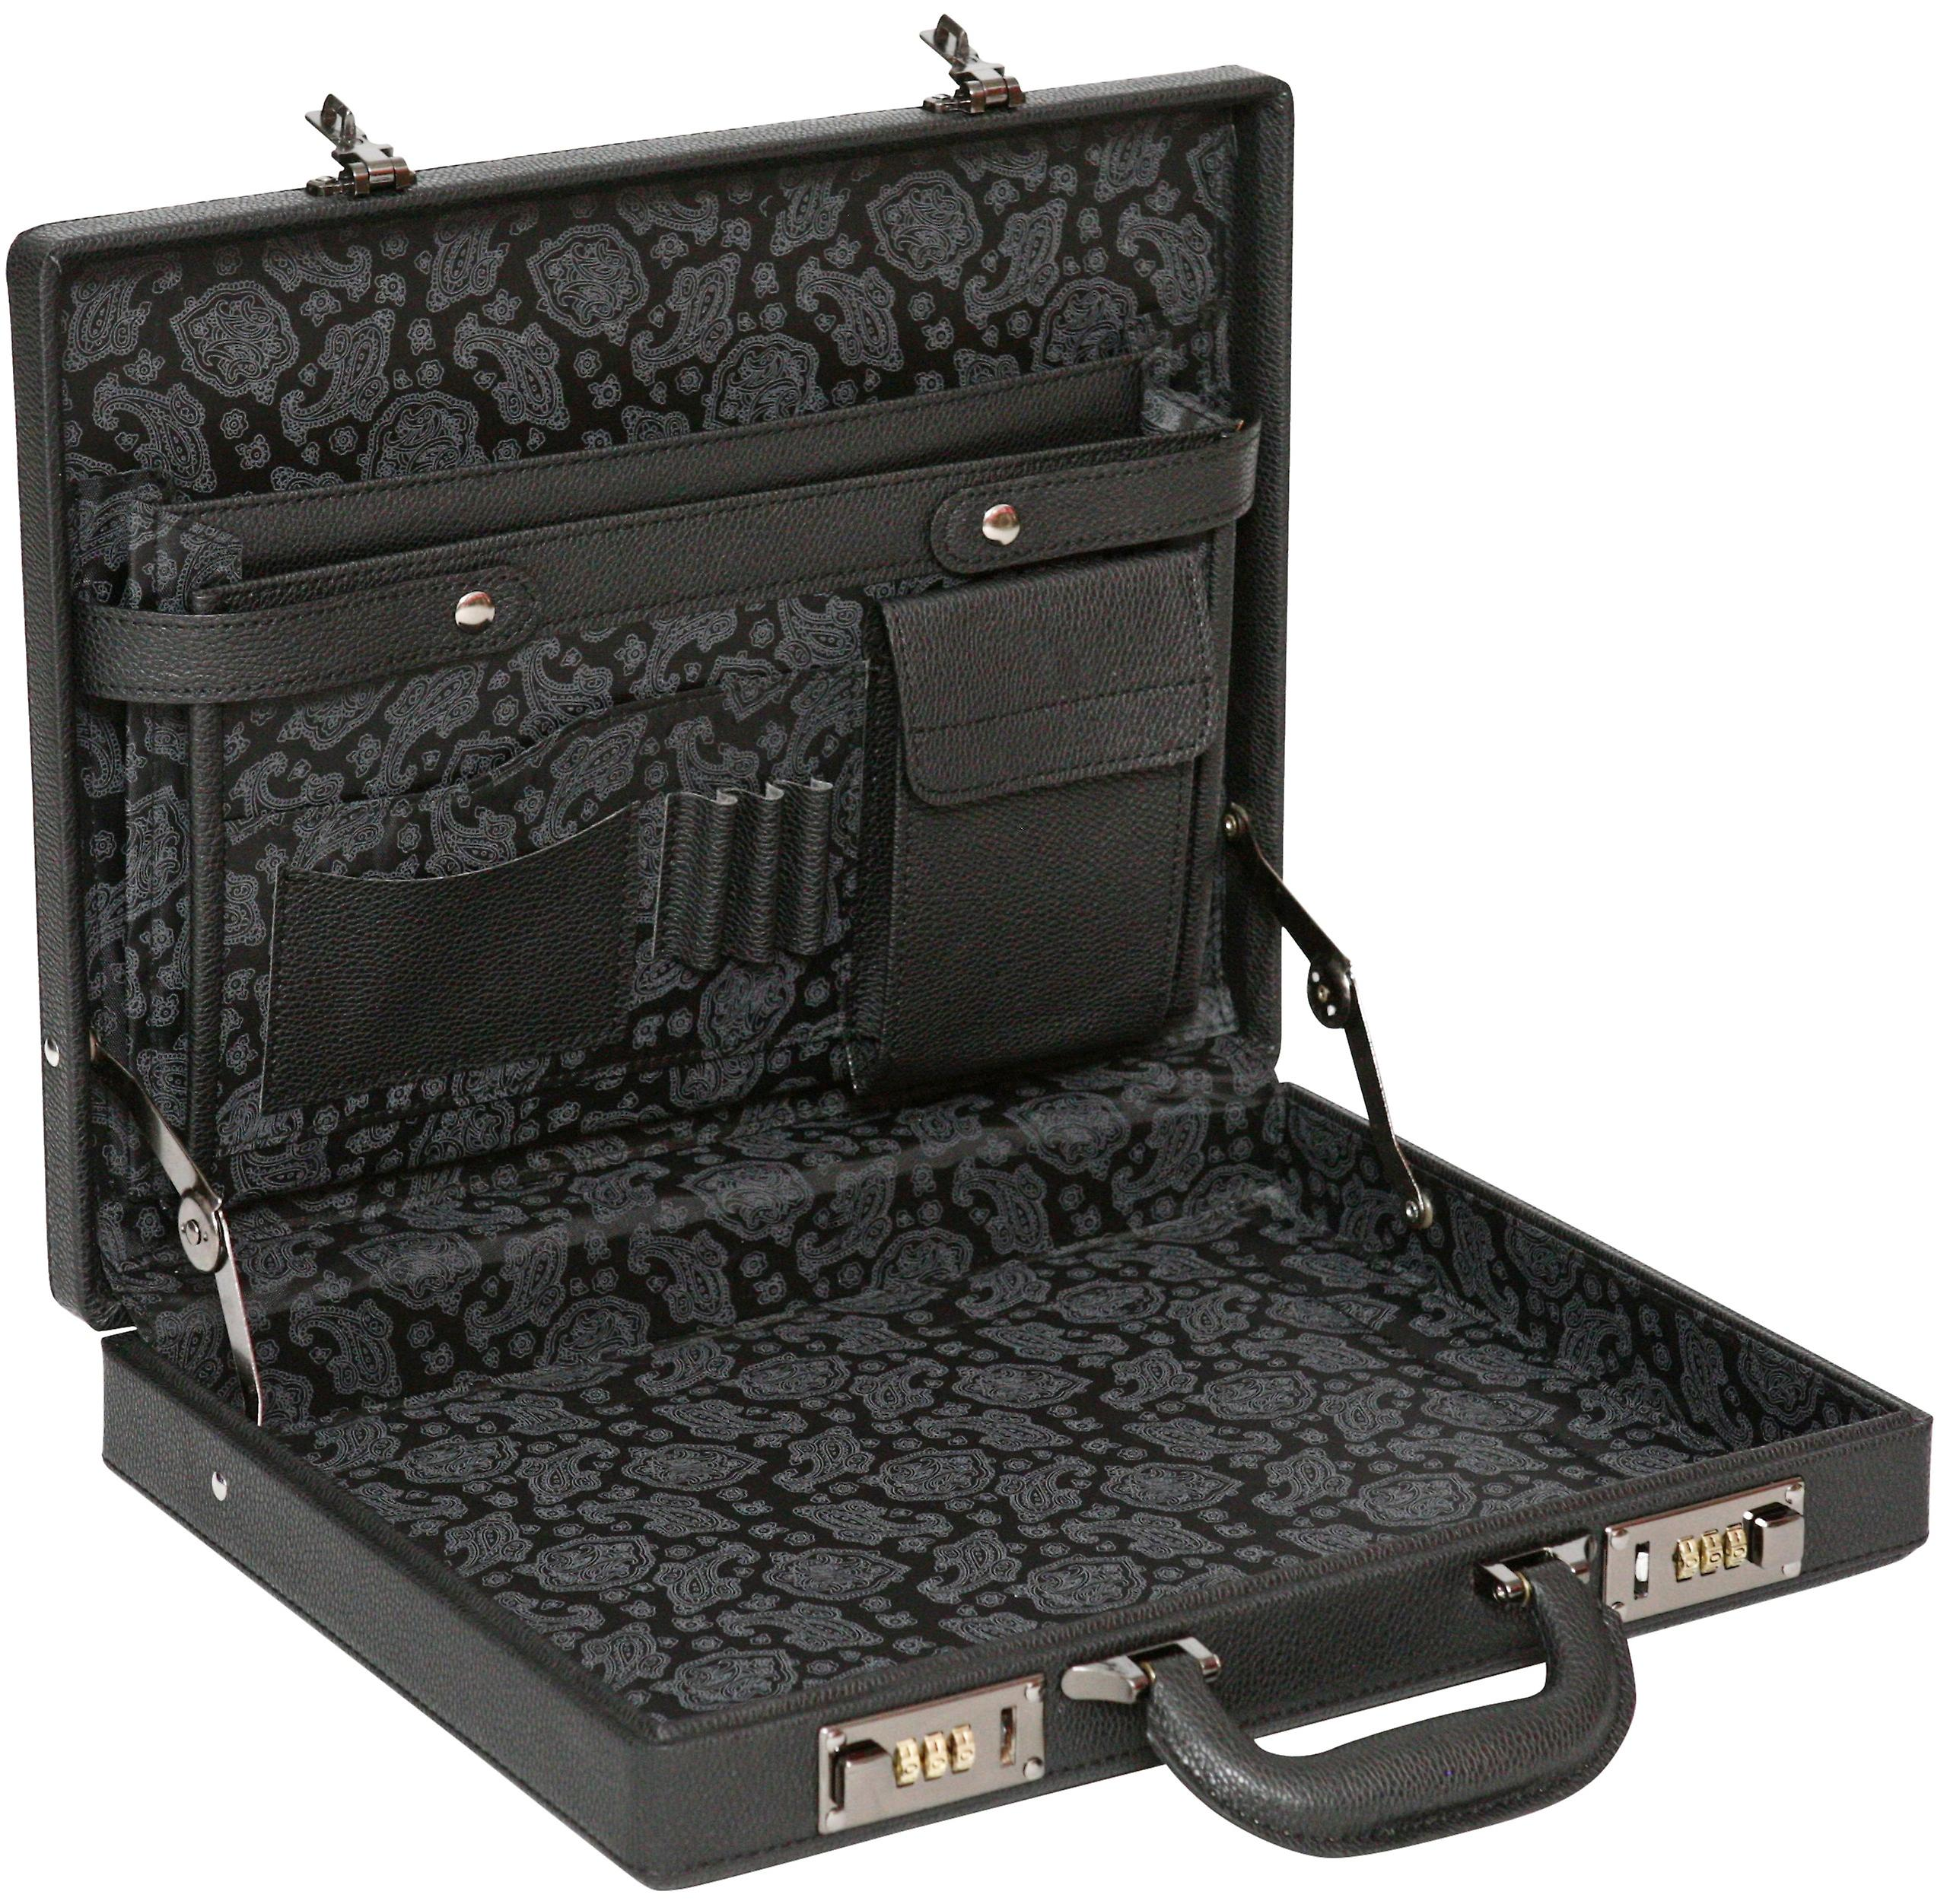 Tassia Slimline Attache Business Briefcase - Leather Look Pu